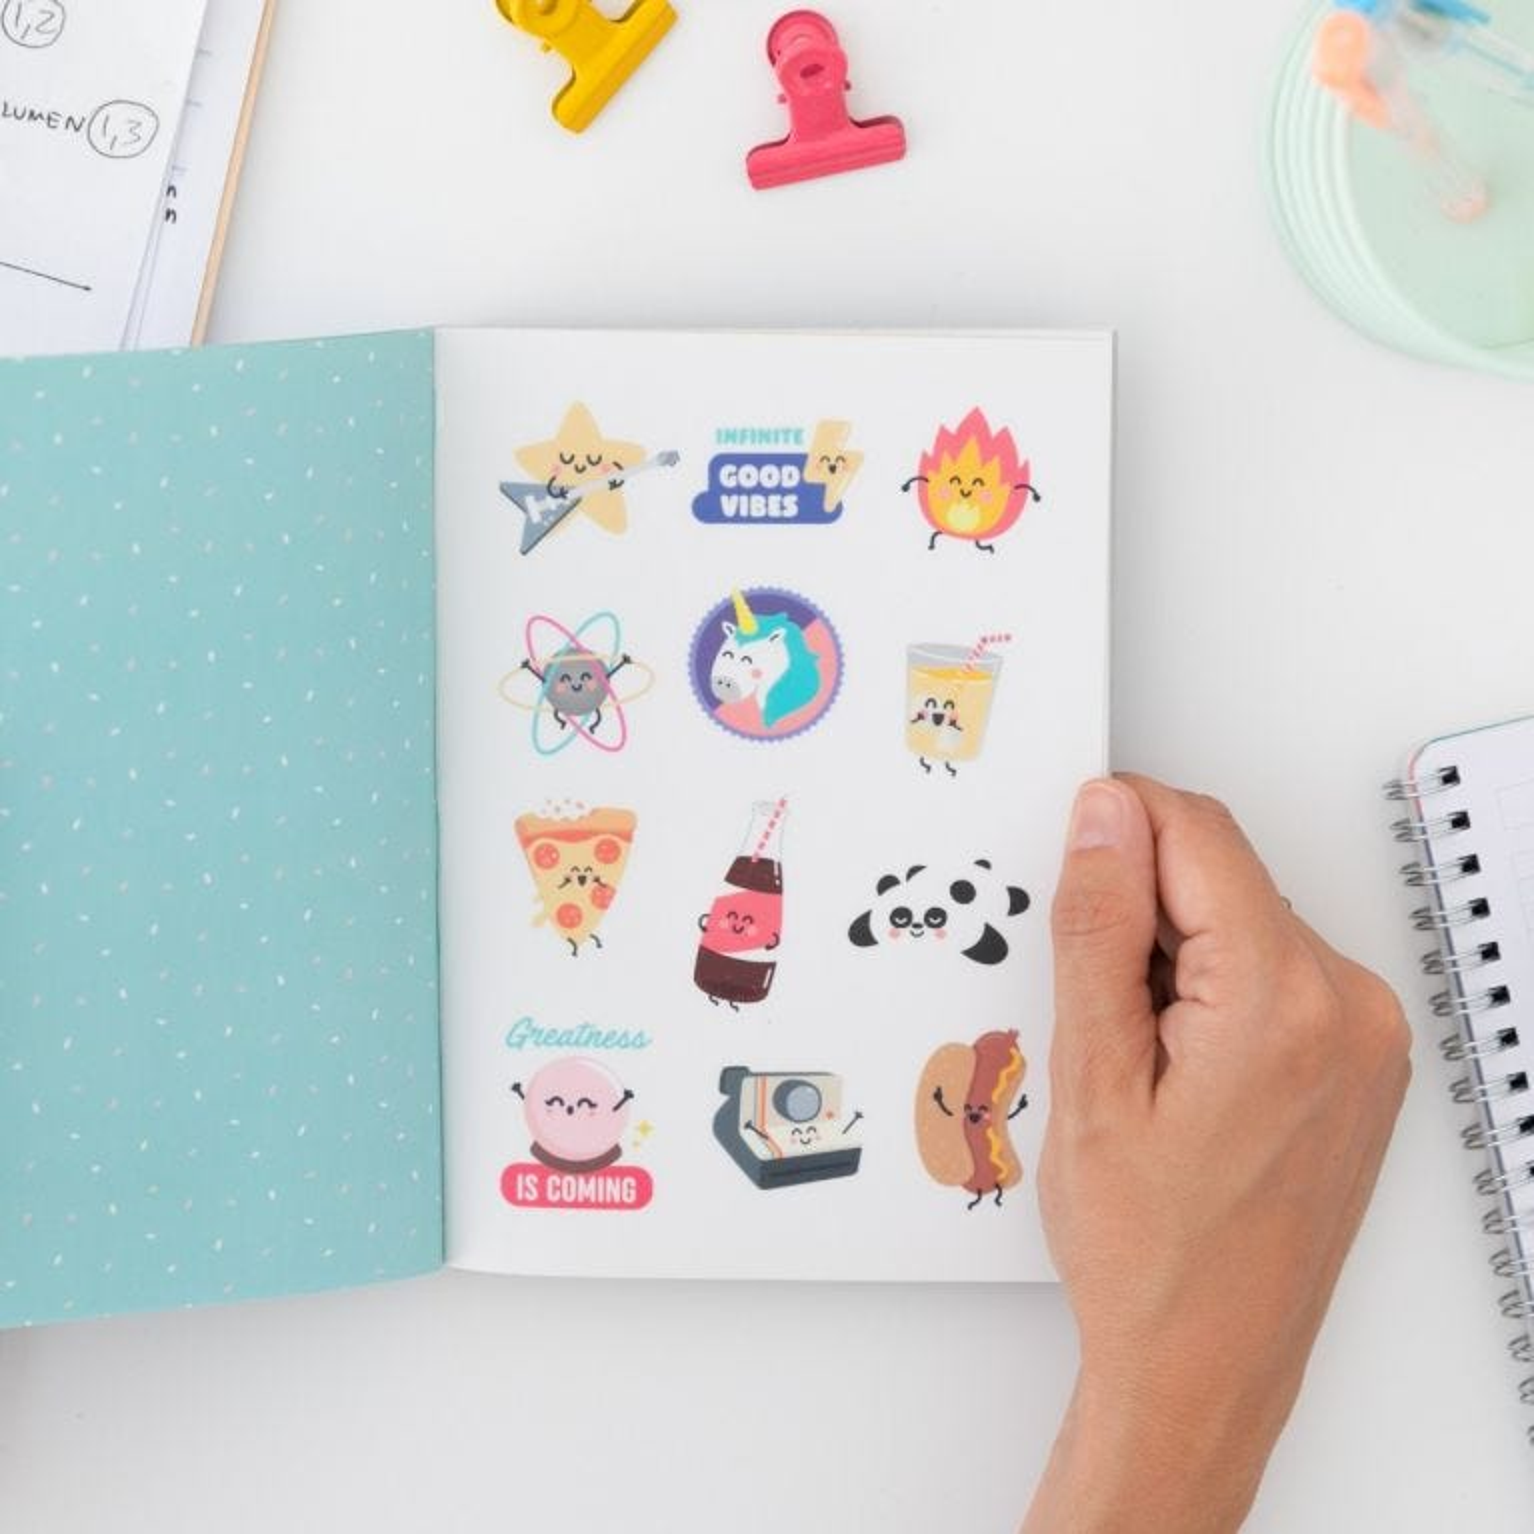 Caderno de autocolantes amovíveis